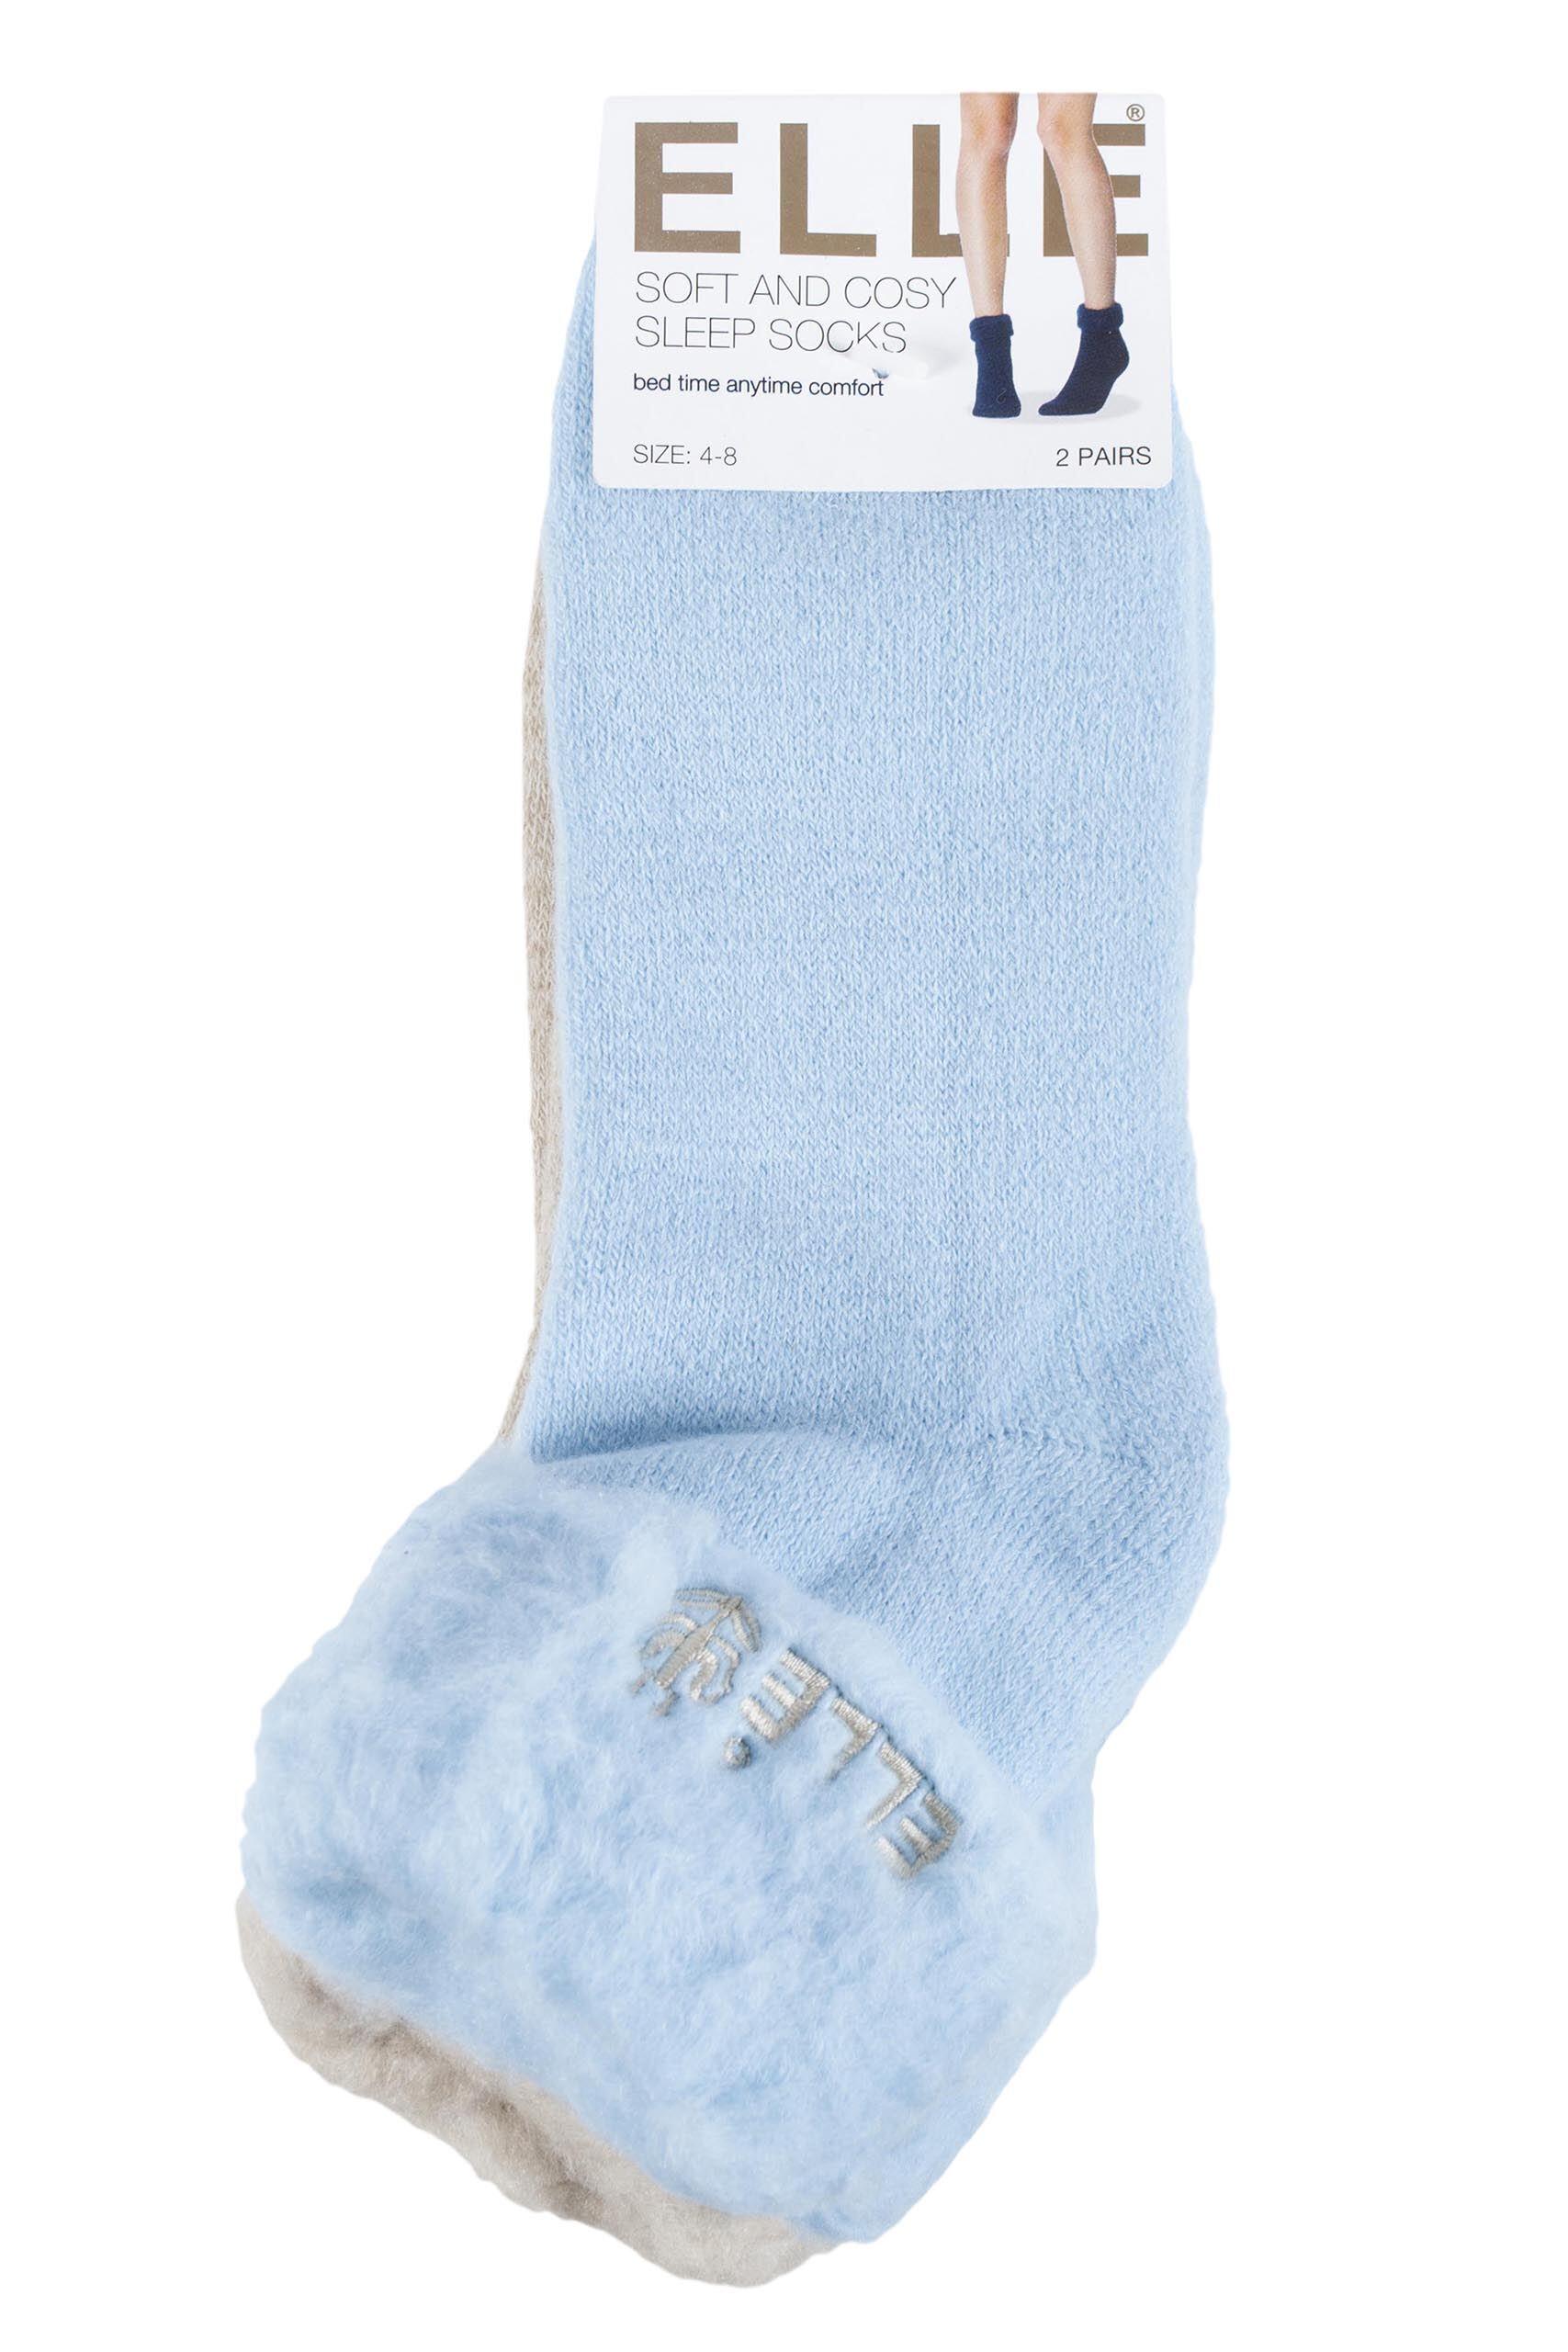 La s Elle Original Cosy Bed Socks from SockShop